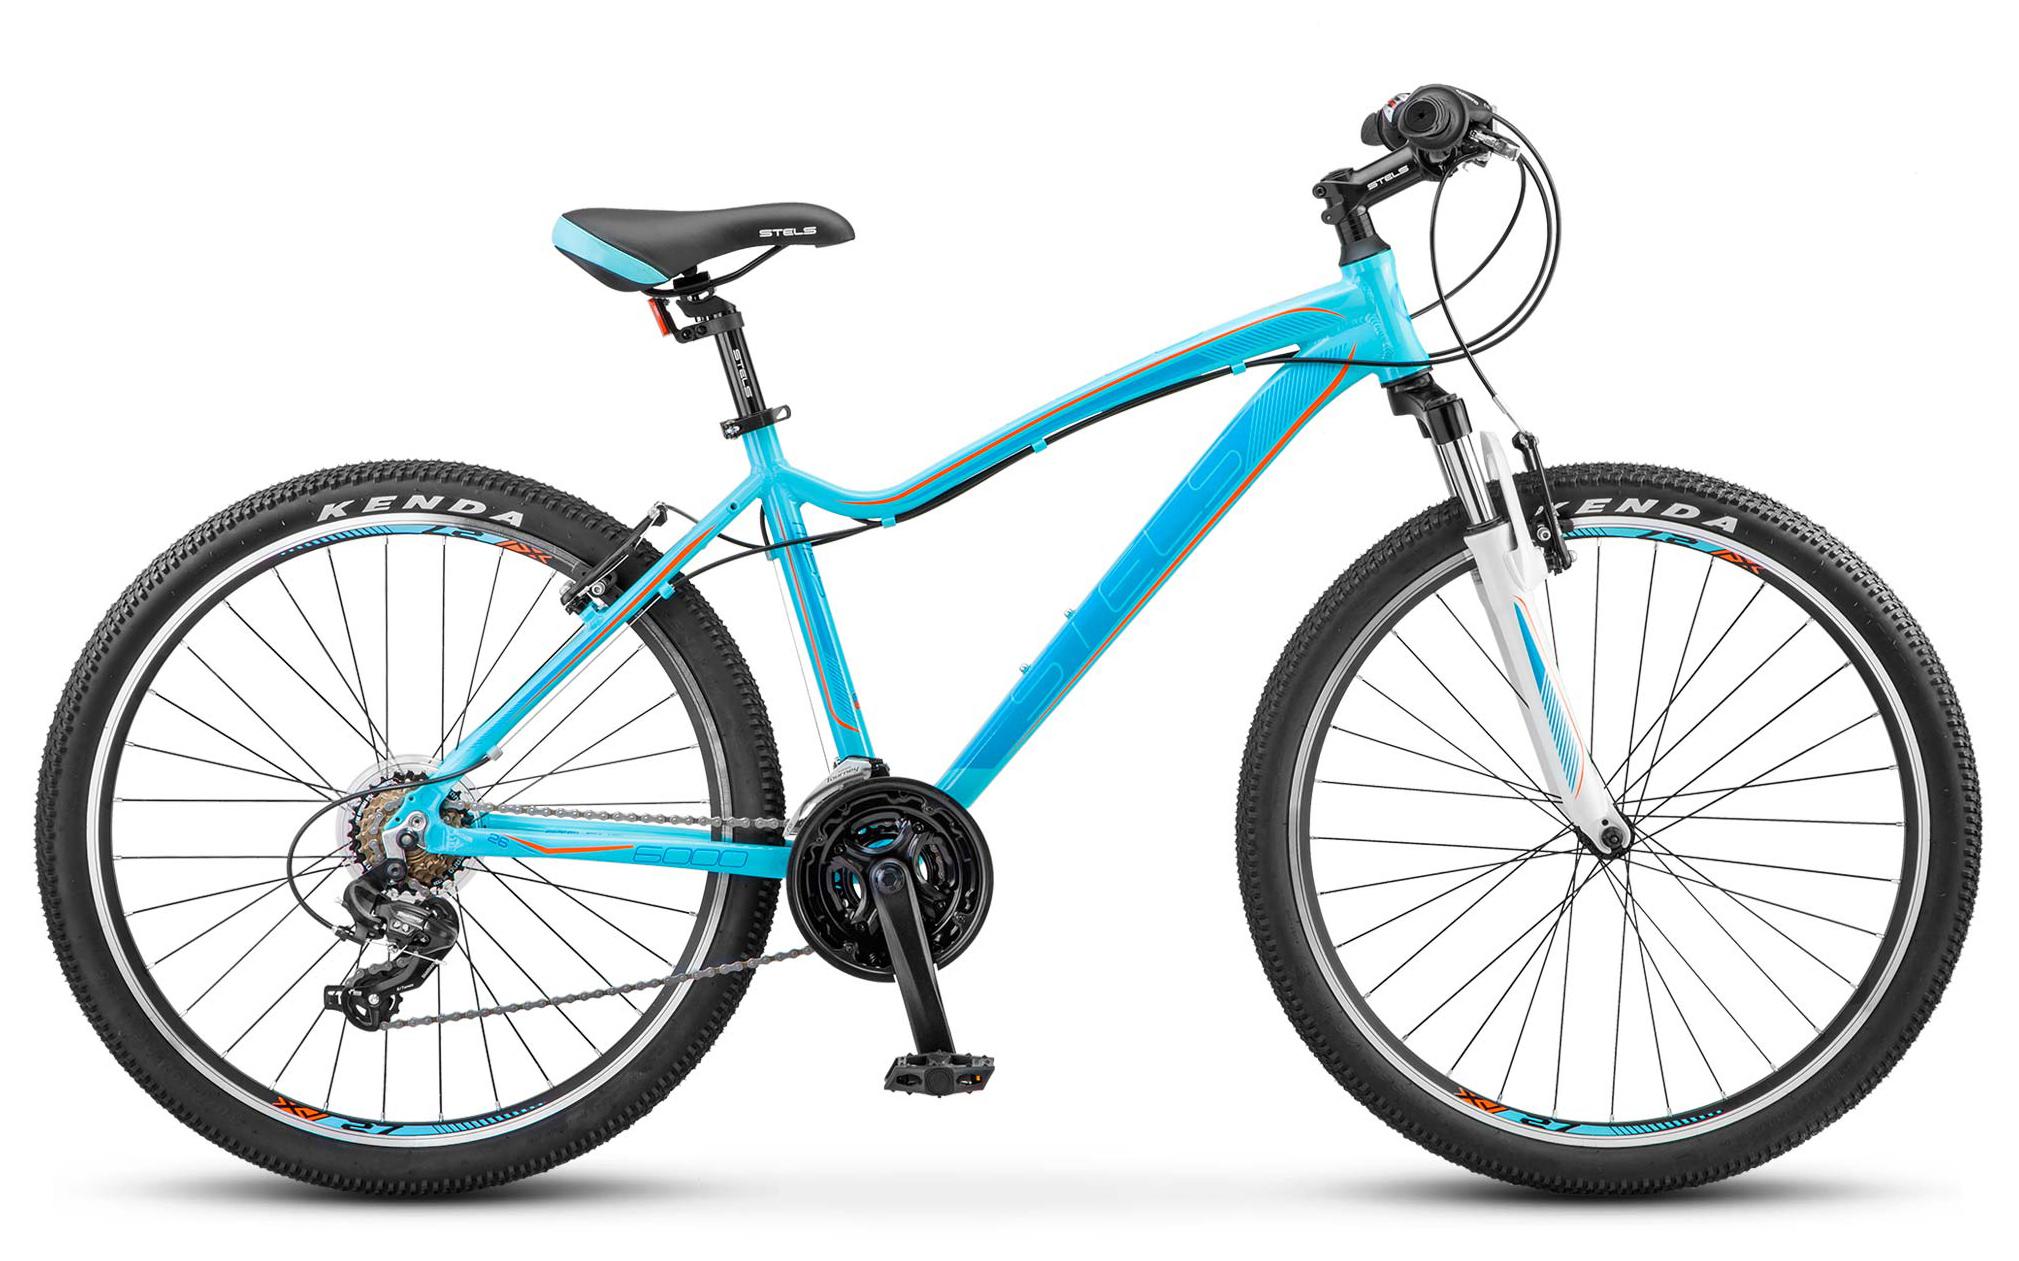 Велосипед Stels Miss 6000 V 26 (V030) 2019 велосипед stels miss 6000 v 26 v030 2018 рама 15 морская волна оранжевый